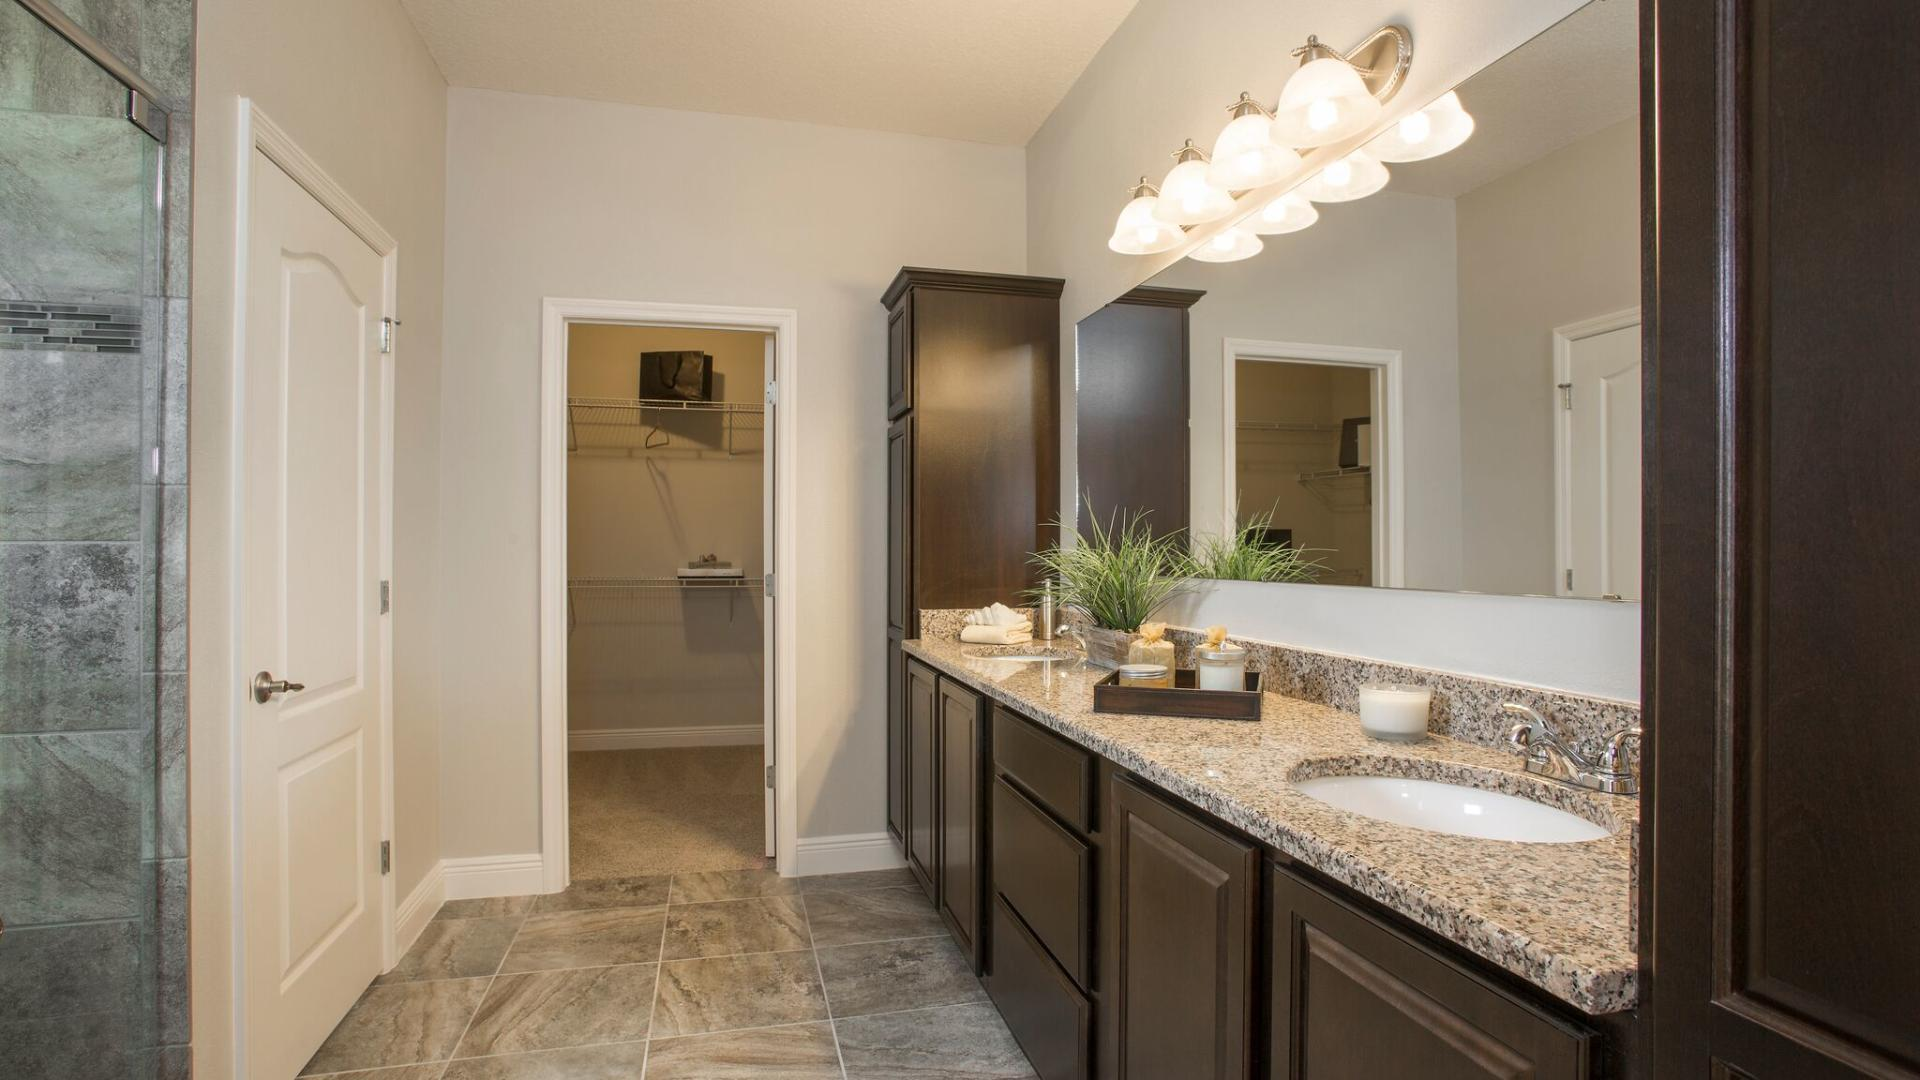 Bathroom featured in the Harmony By Maronda Homes in Daytona Beach, FL